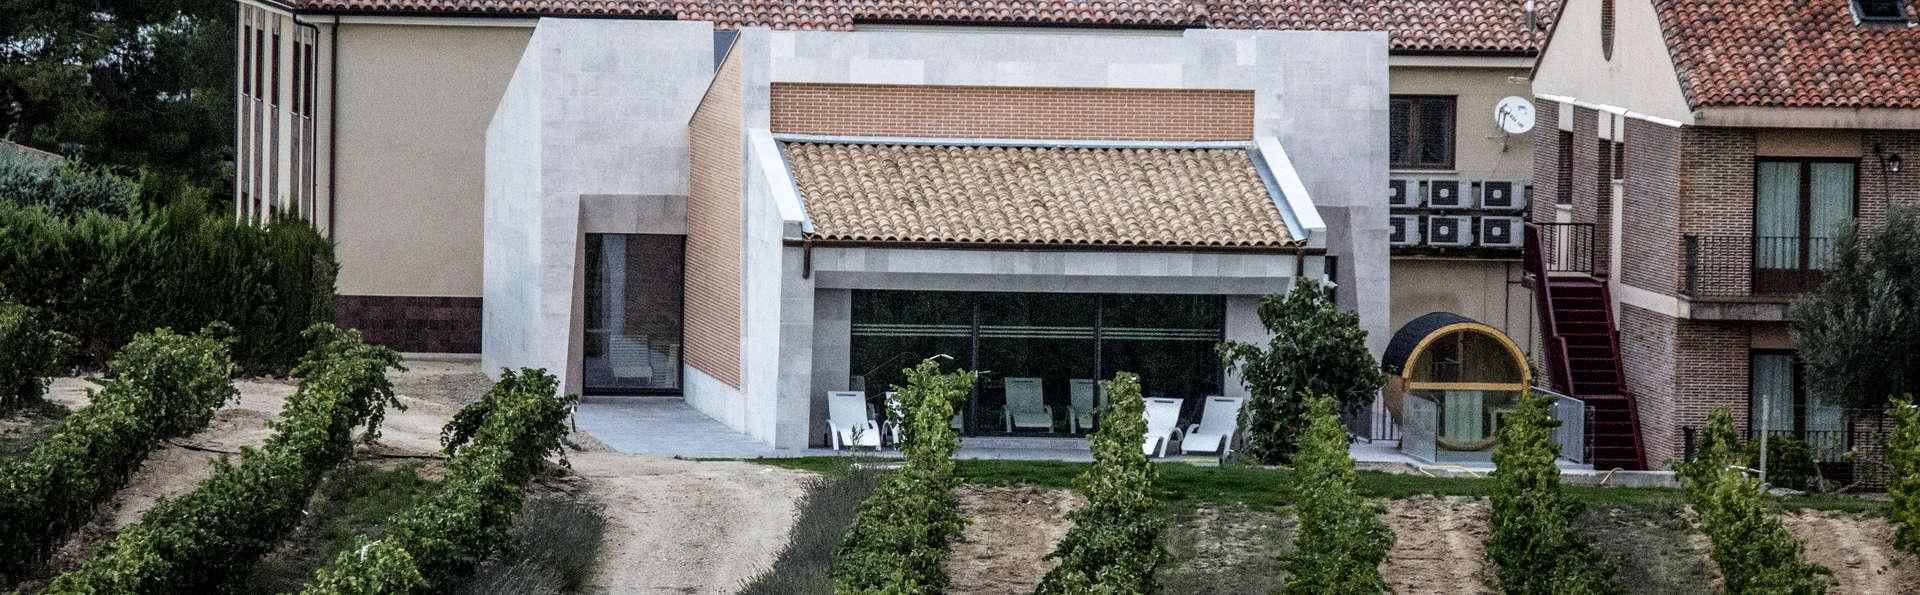 Hotel Spa Tudanca Aranda - Spa_Tudanca_Septiembre_41.jpg